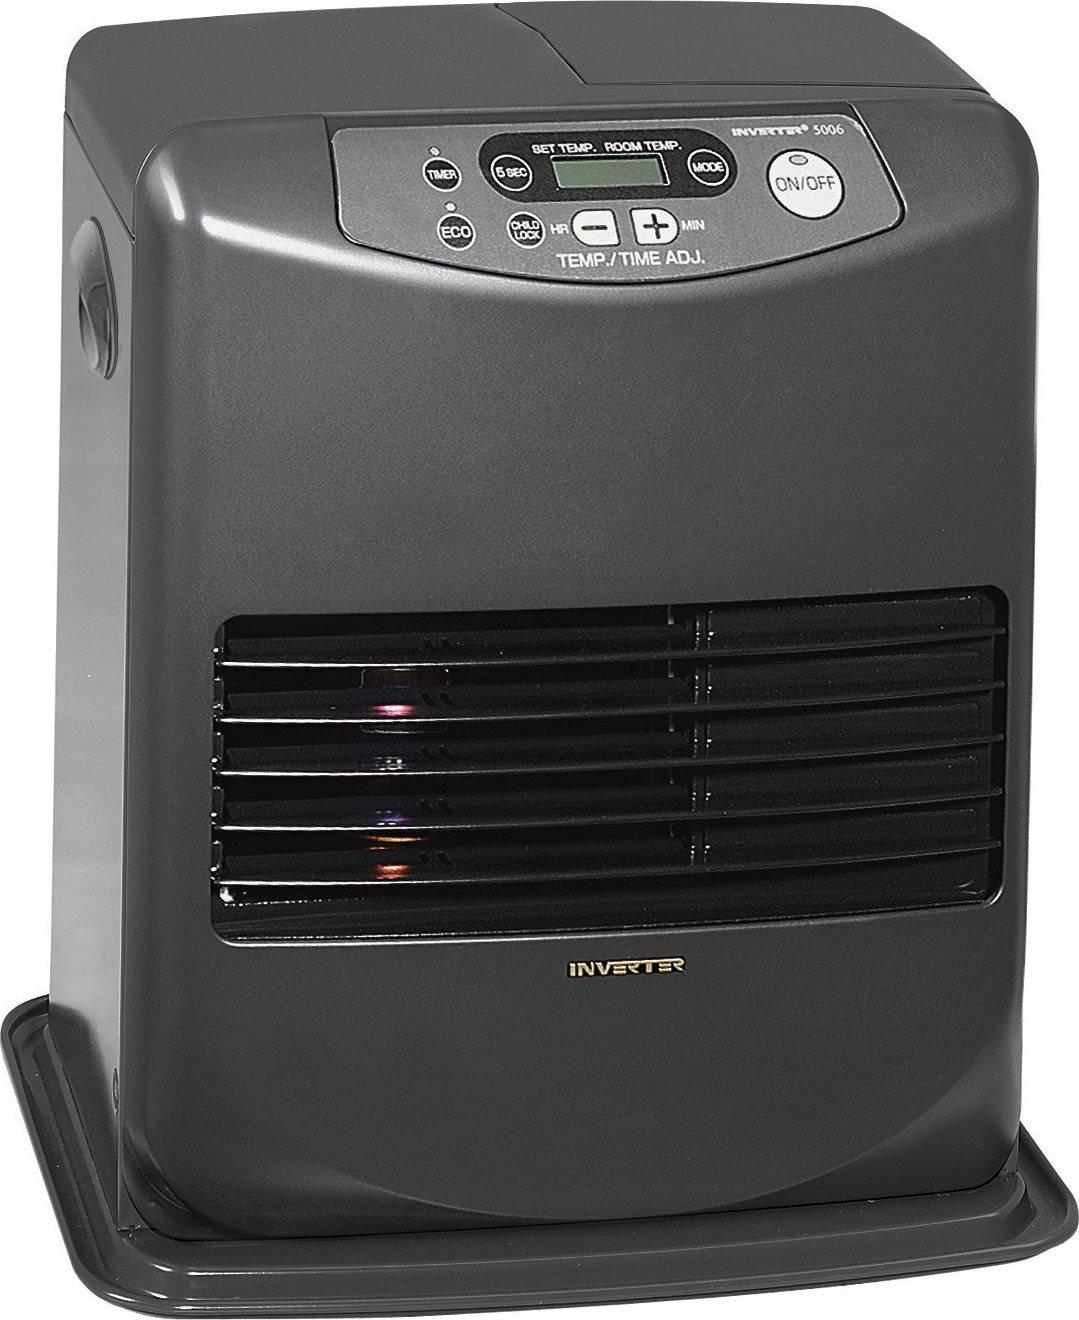 Tecnoair stufa a combustibile liquido ventilata portatile - Stufa a combustibile liquido prezzi ...